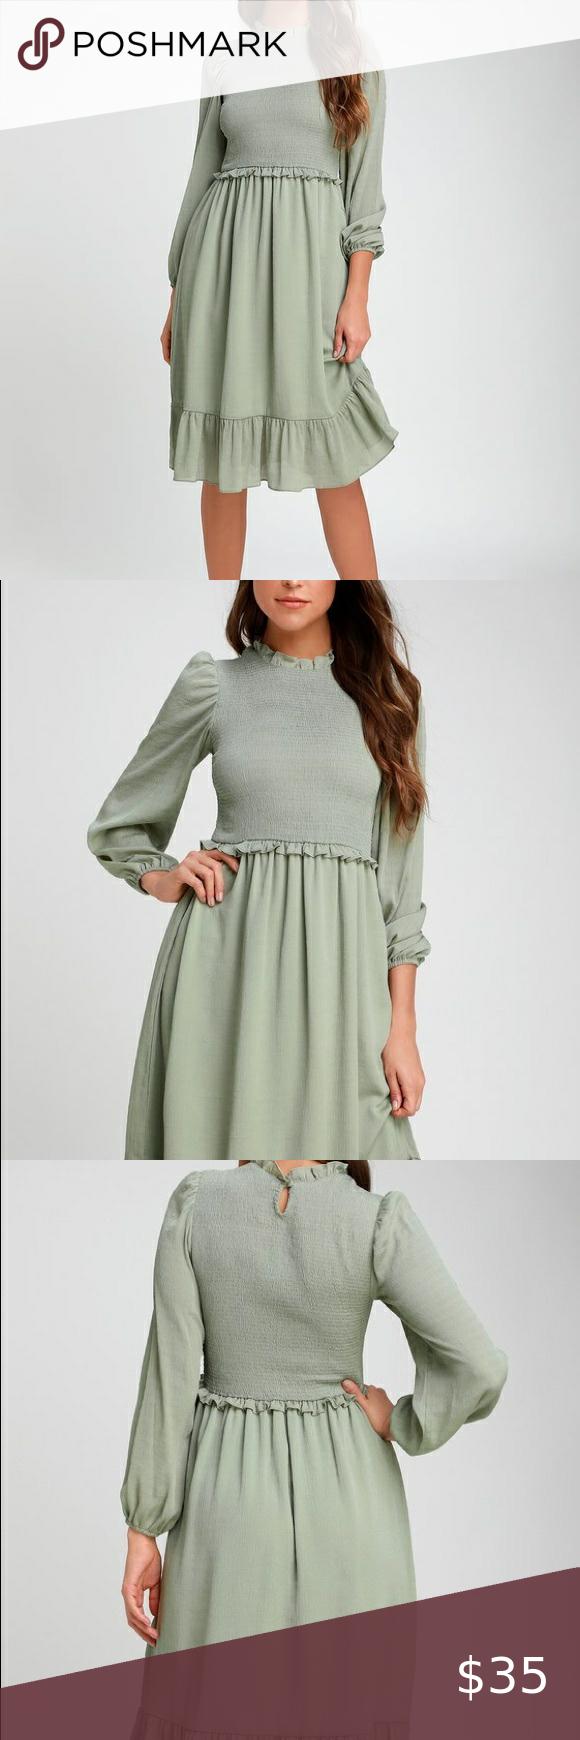 Nwt Lulu S Smock Dress Smock Dress Long Sleeve Midi Dress Lulu Dresses [ 1740 x 580 Pixel ]